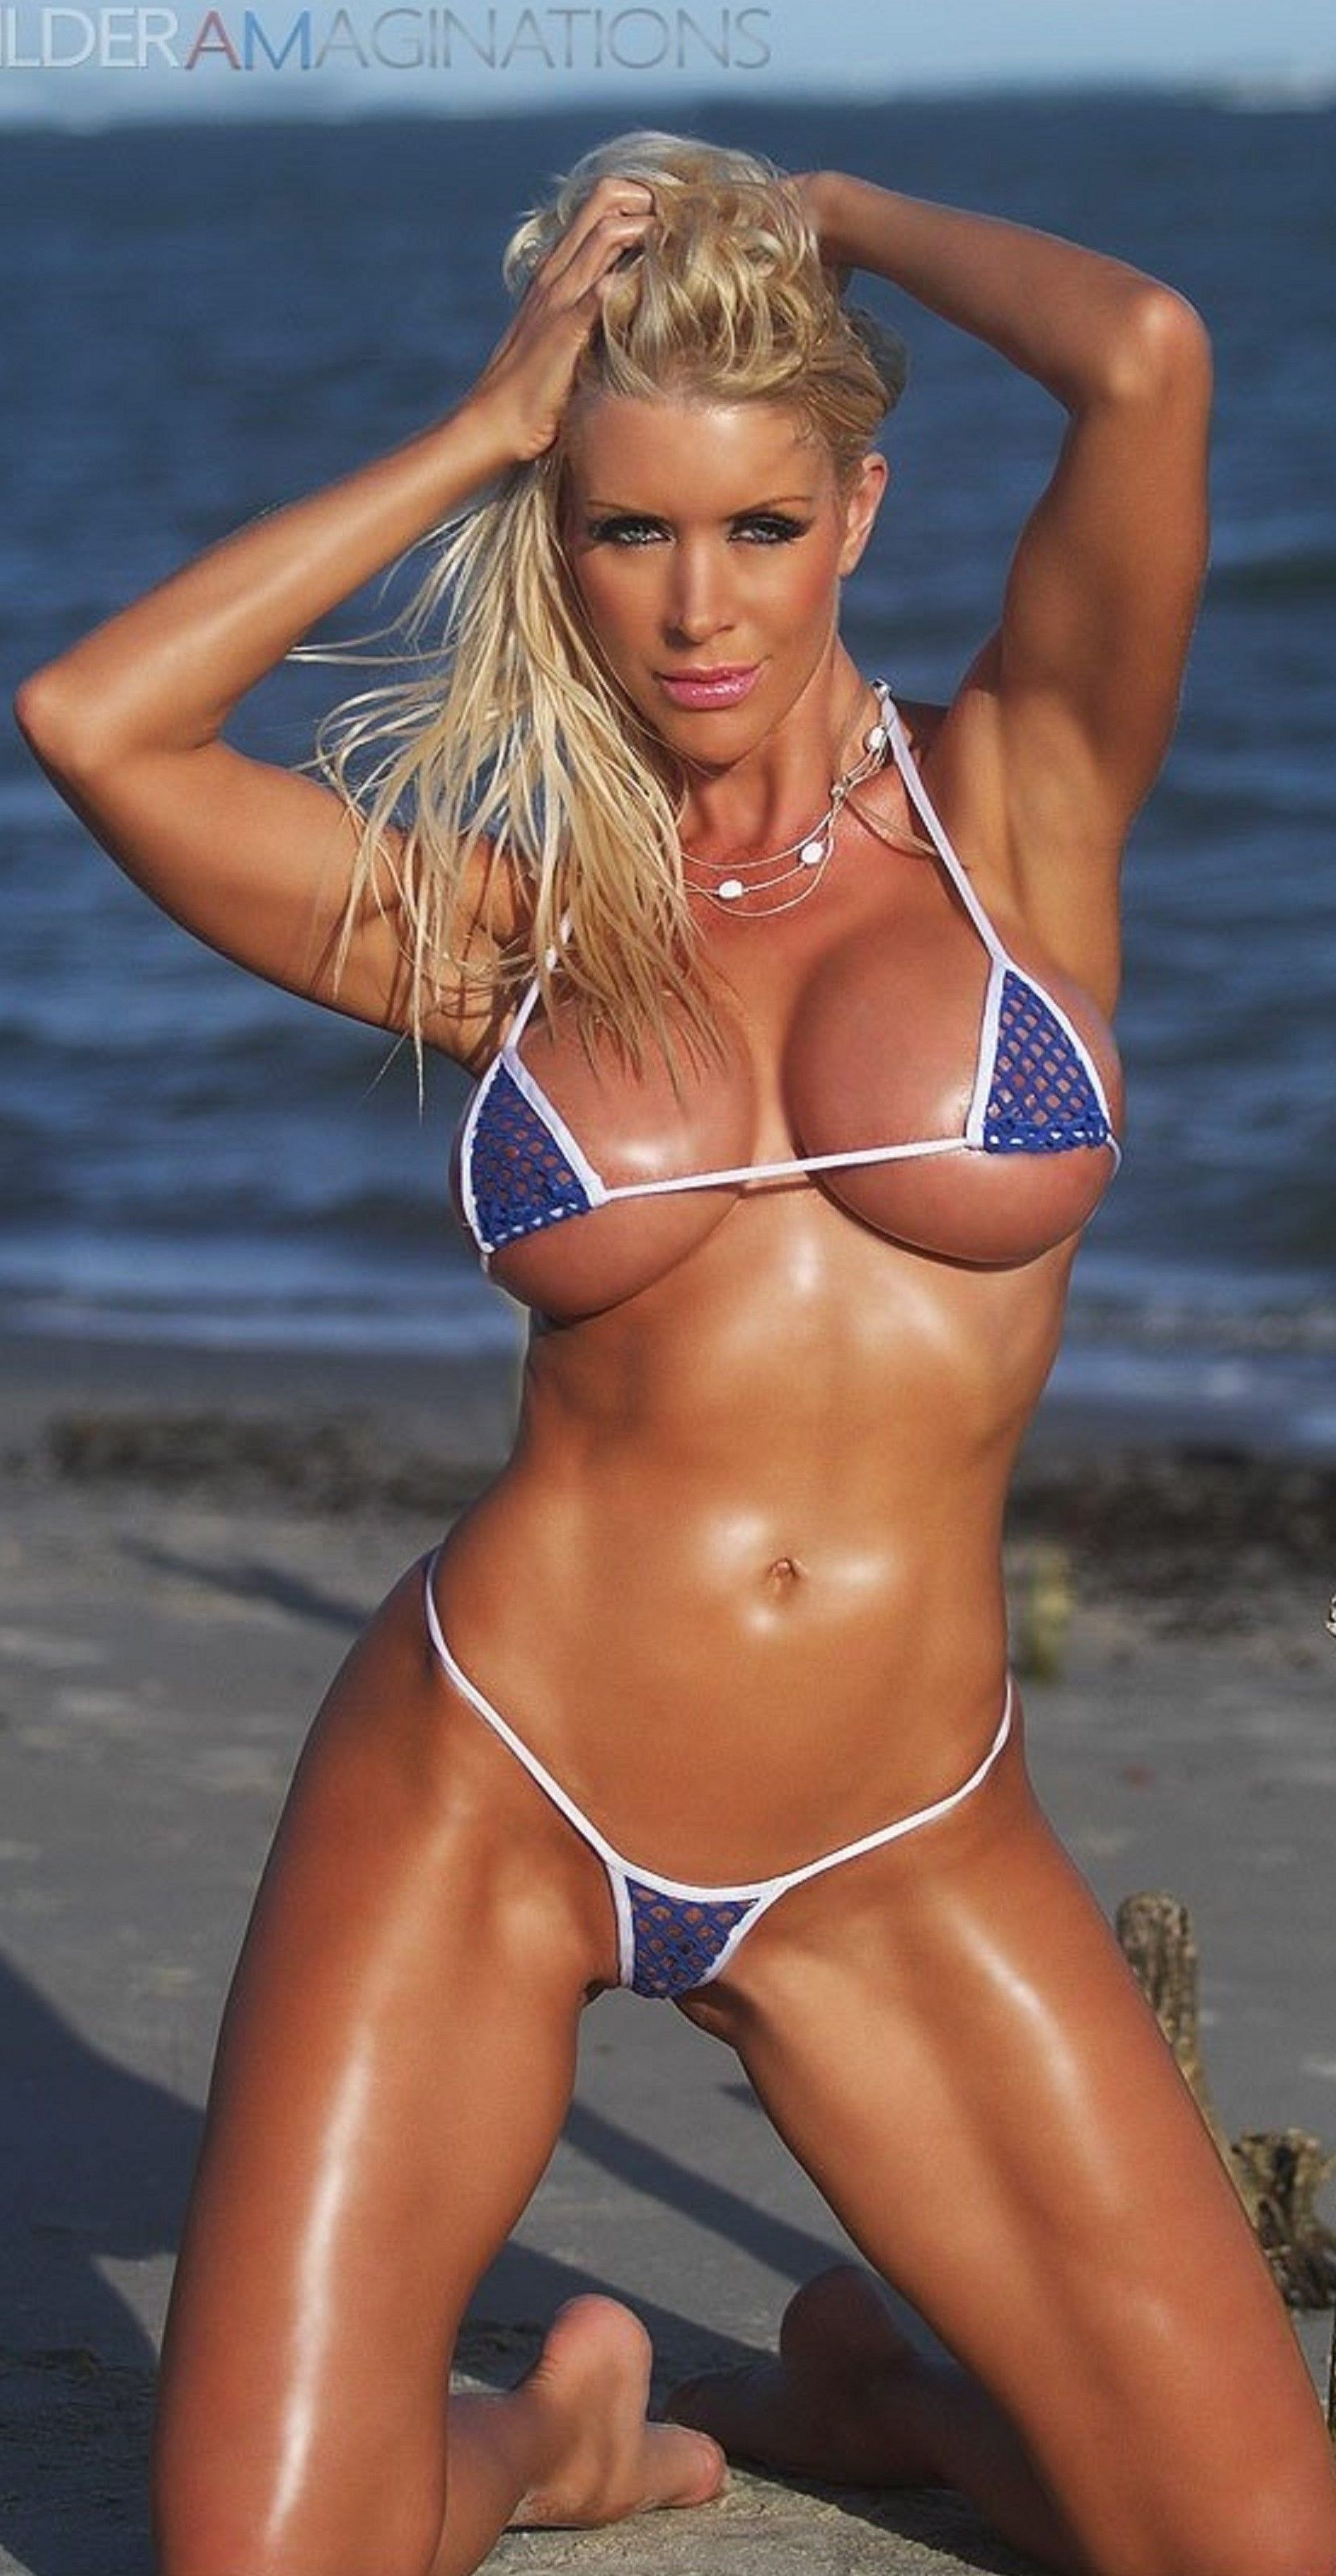 Tania % | TANIA AMAZON | Pinterest | Swimwear, Swimsuits ...